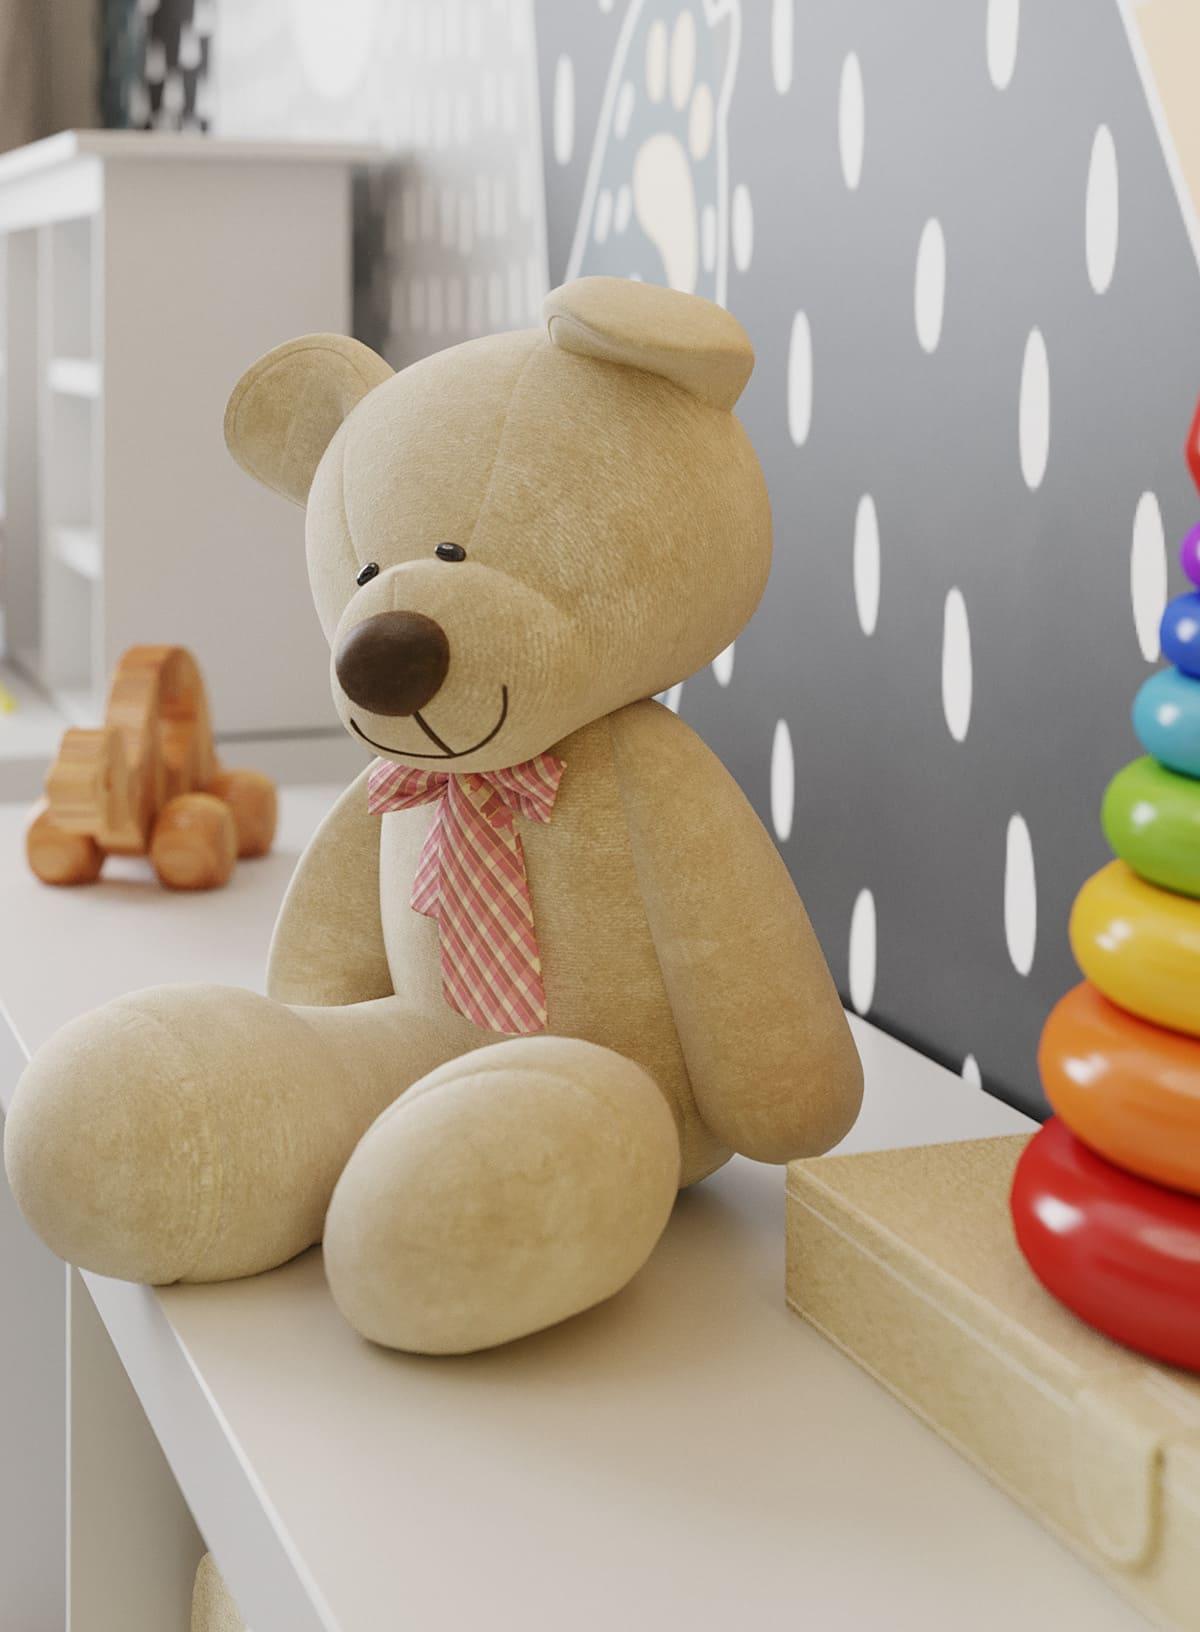 интерьер детской комнаты фото 105